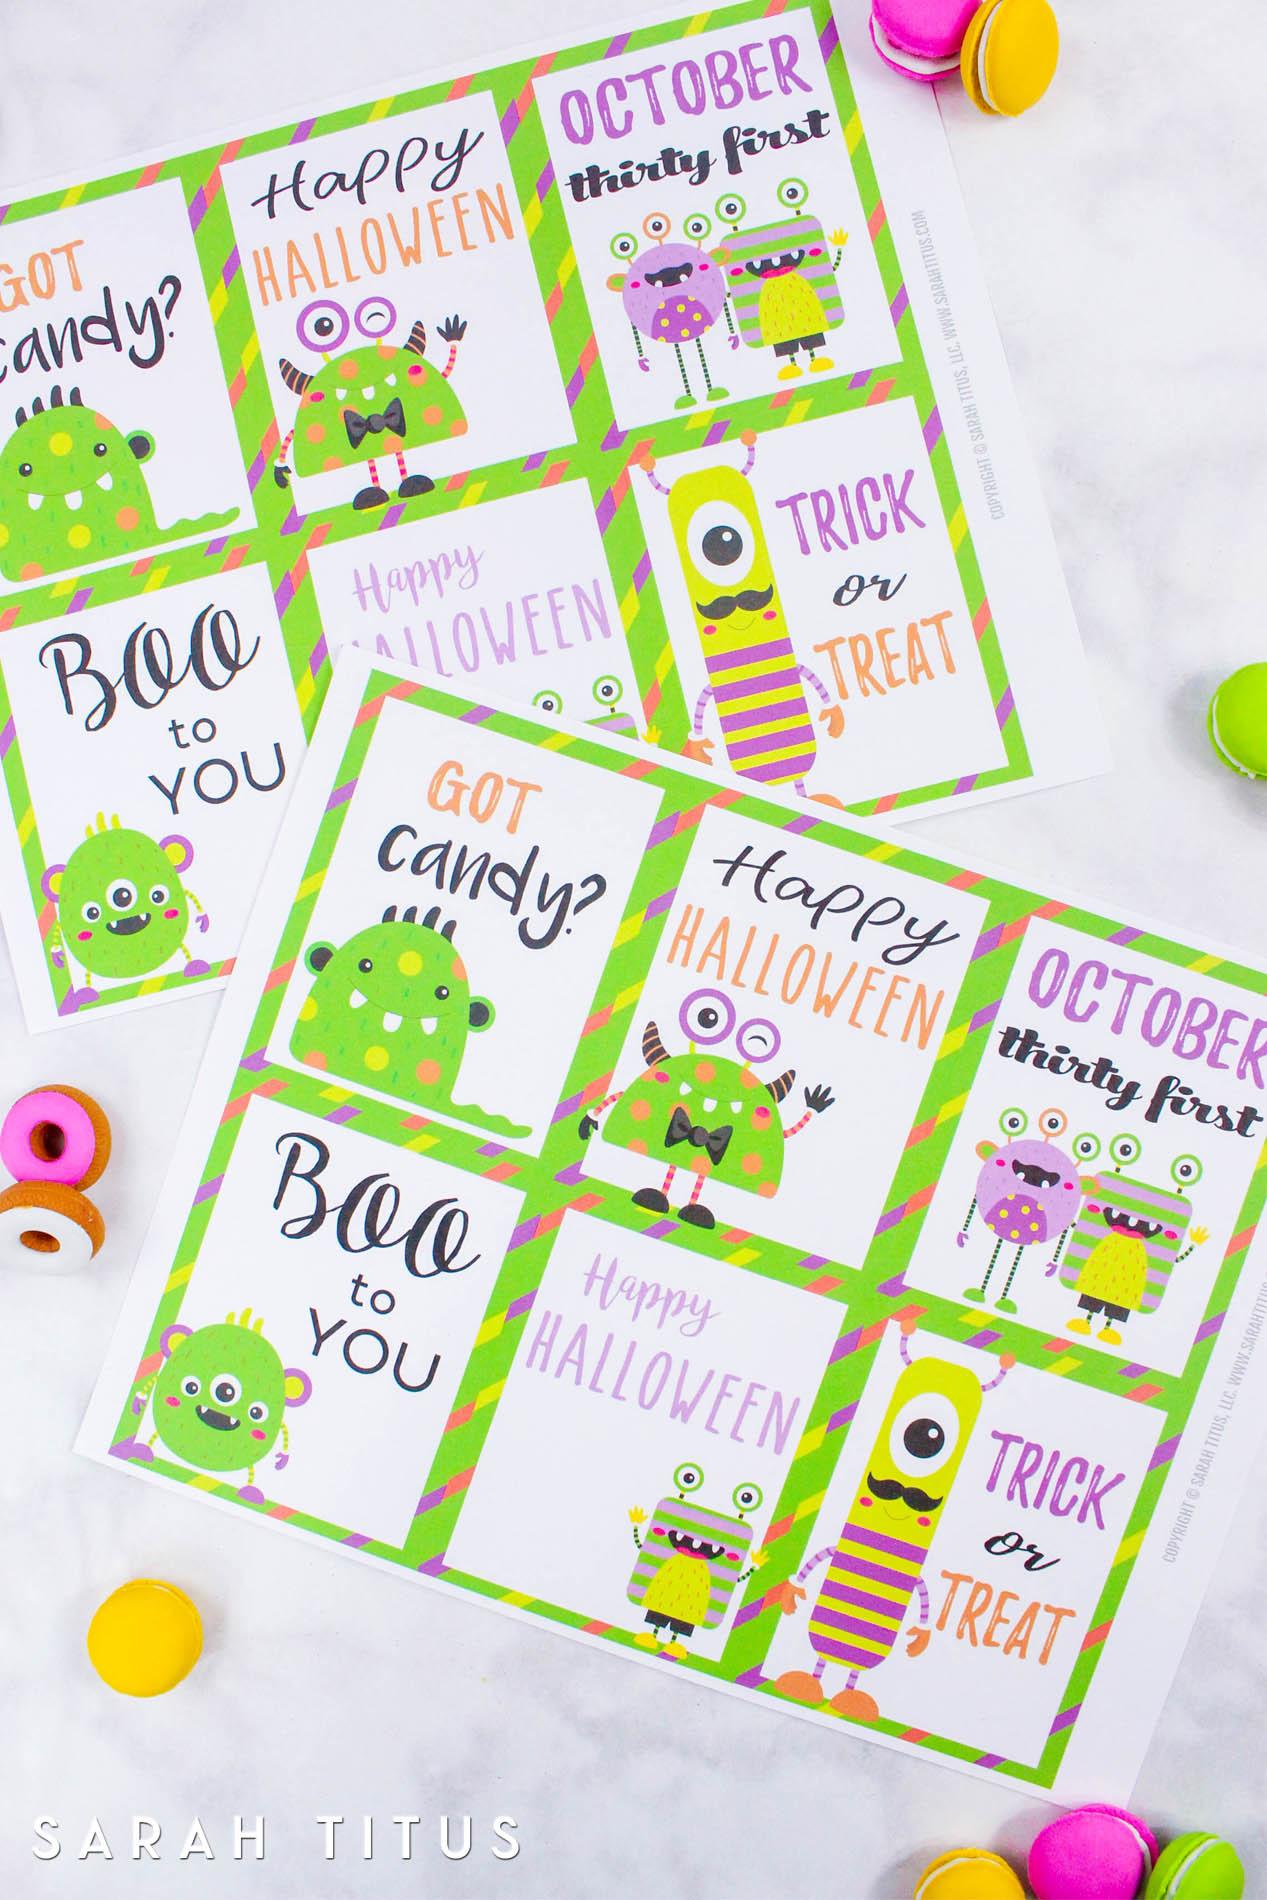 photo regarding Printable Memory Cards referred to as Halloween Free of charge Printable Memory Playing cards - Sarah Titus